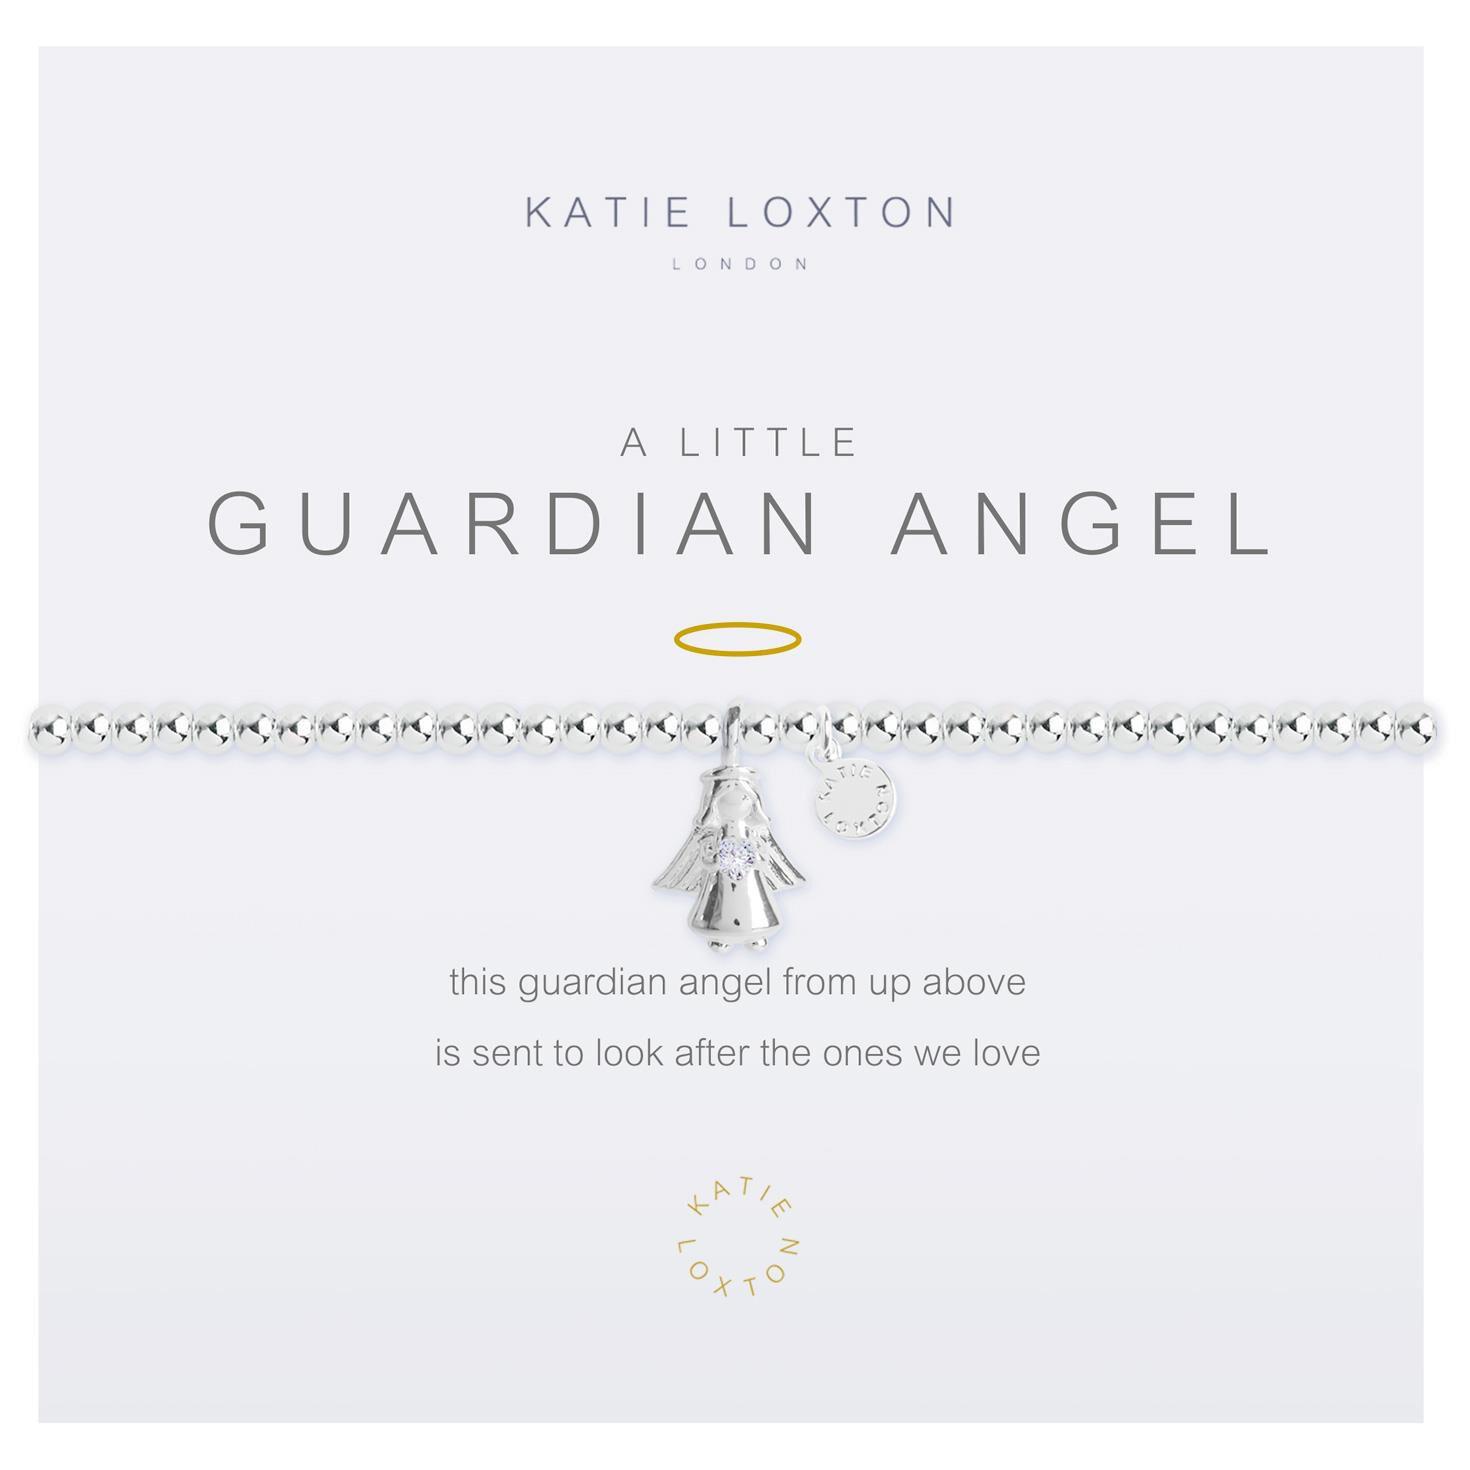 d9352d3a4015b Katie Loxton A Little Guardian Angel Silver Bracelet